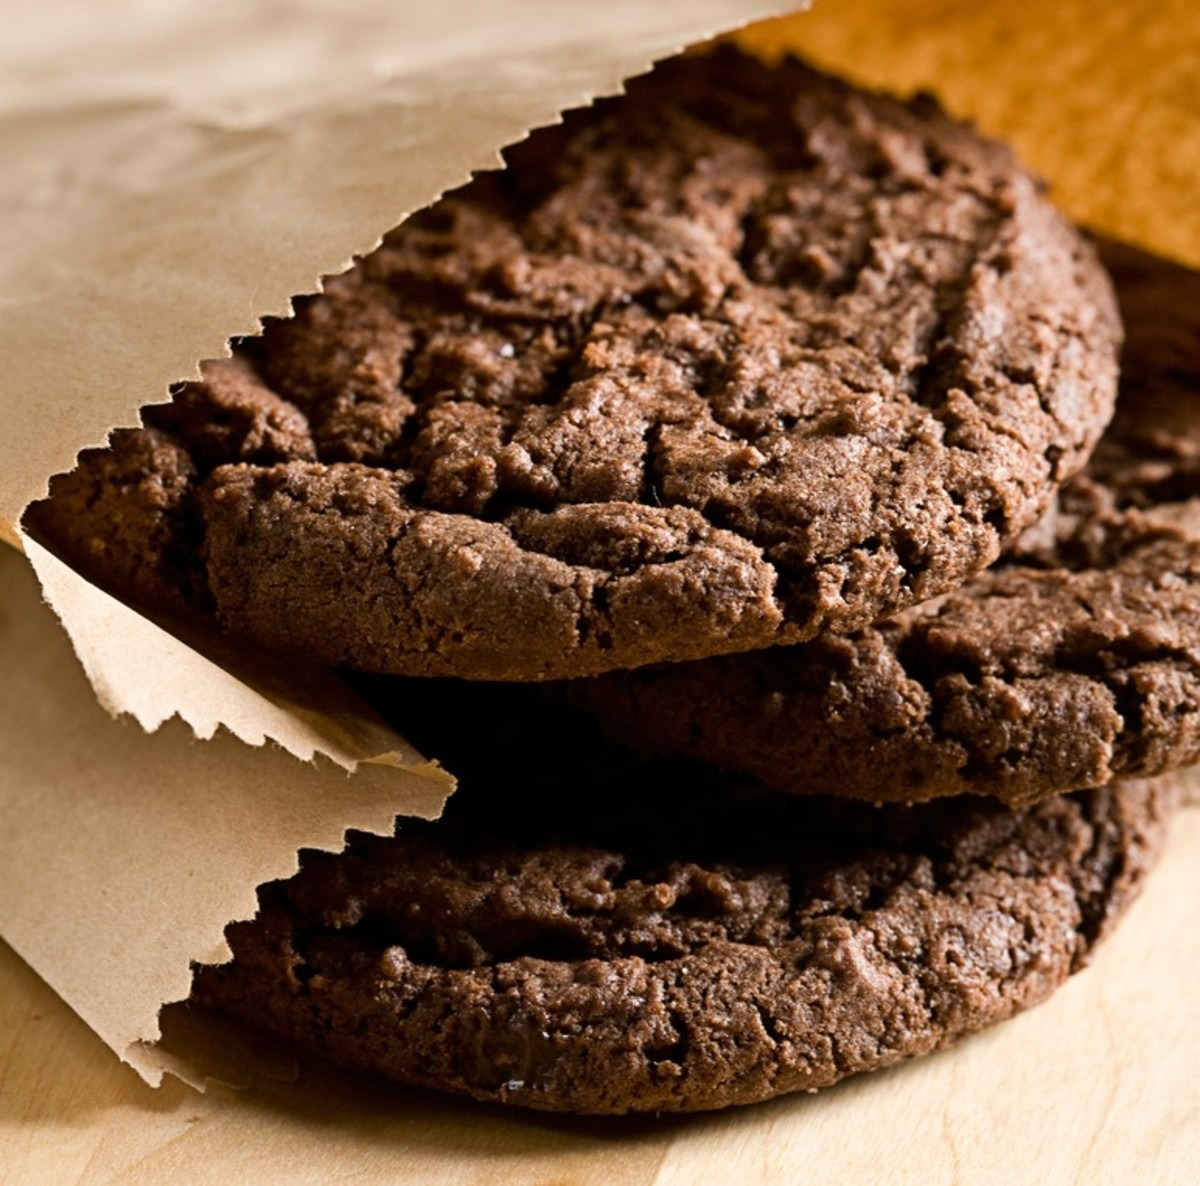 Chocolate Chocolate Cookies With Cookie Crumbs